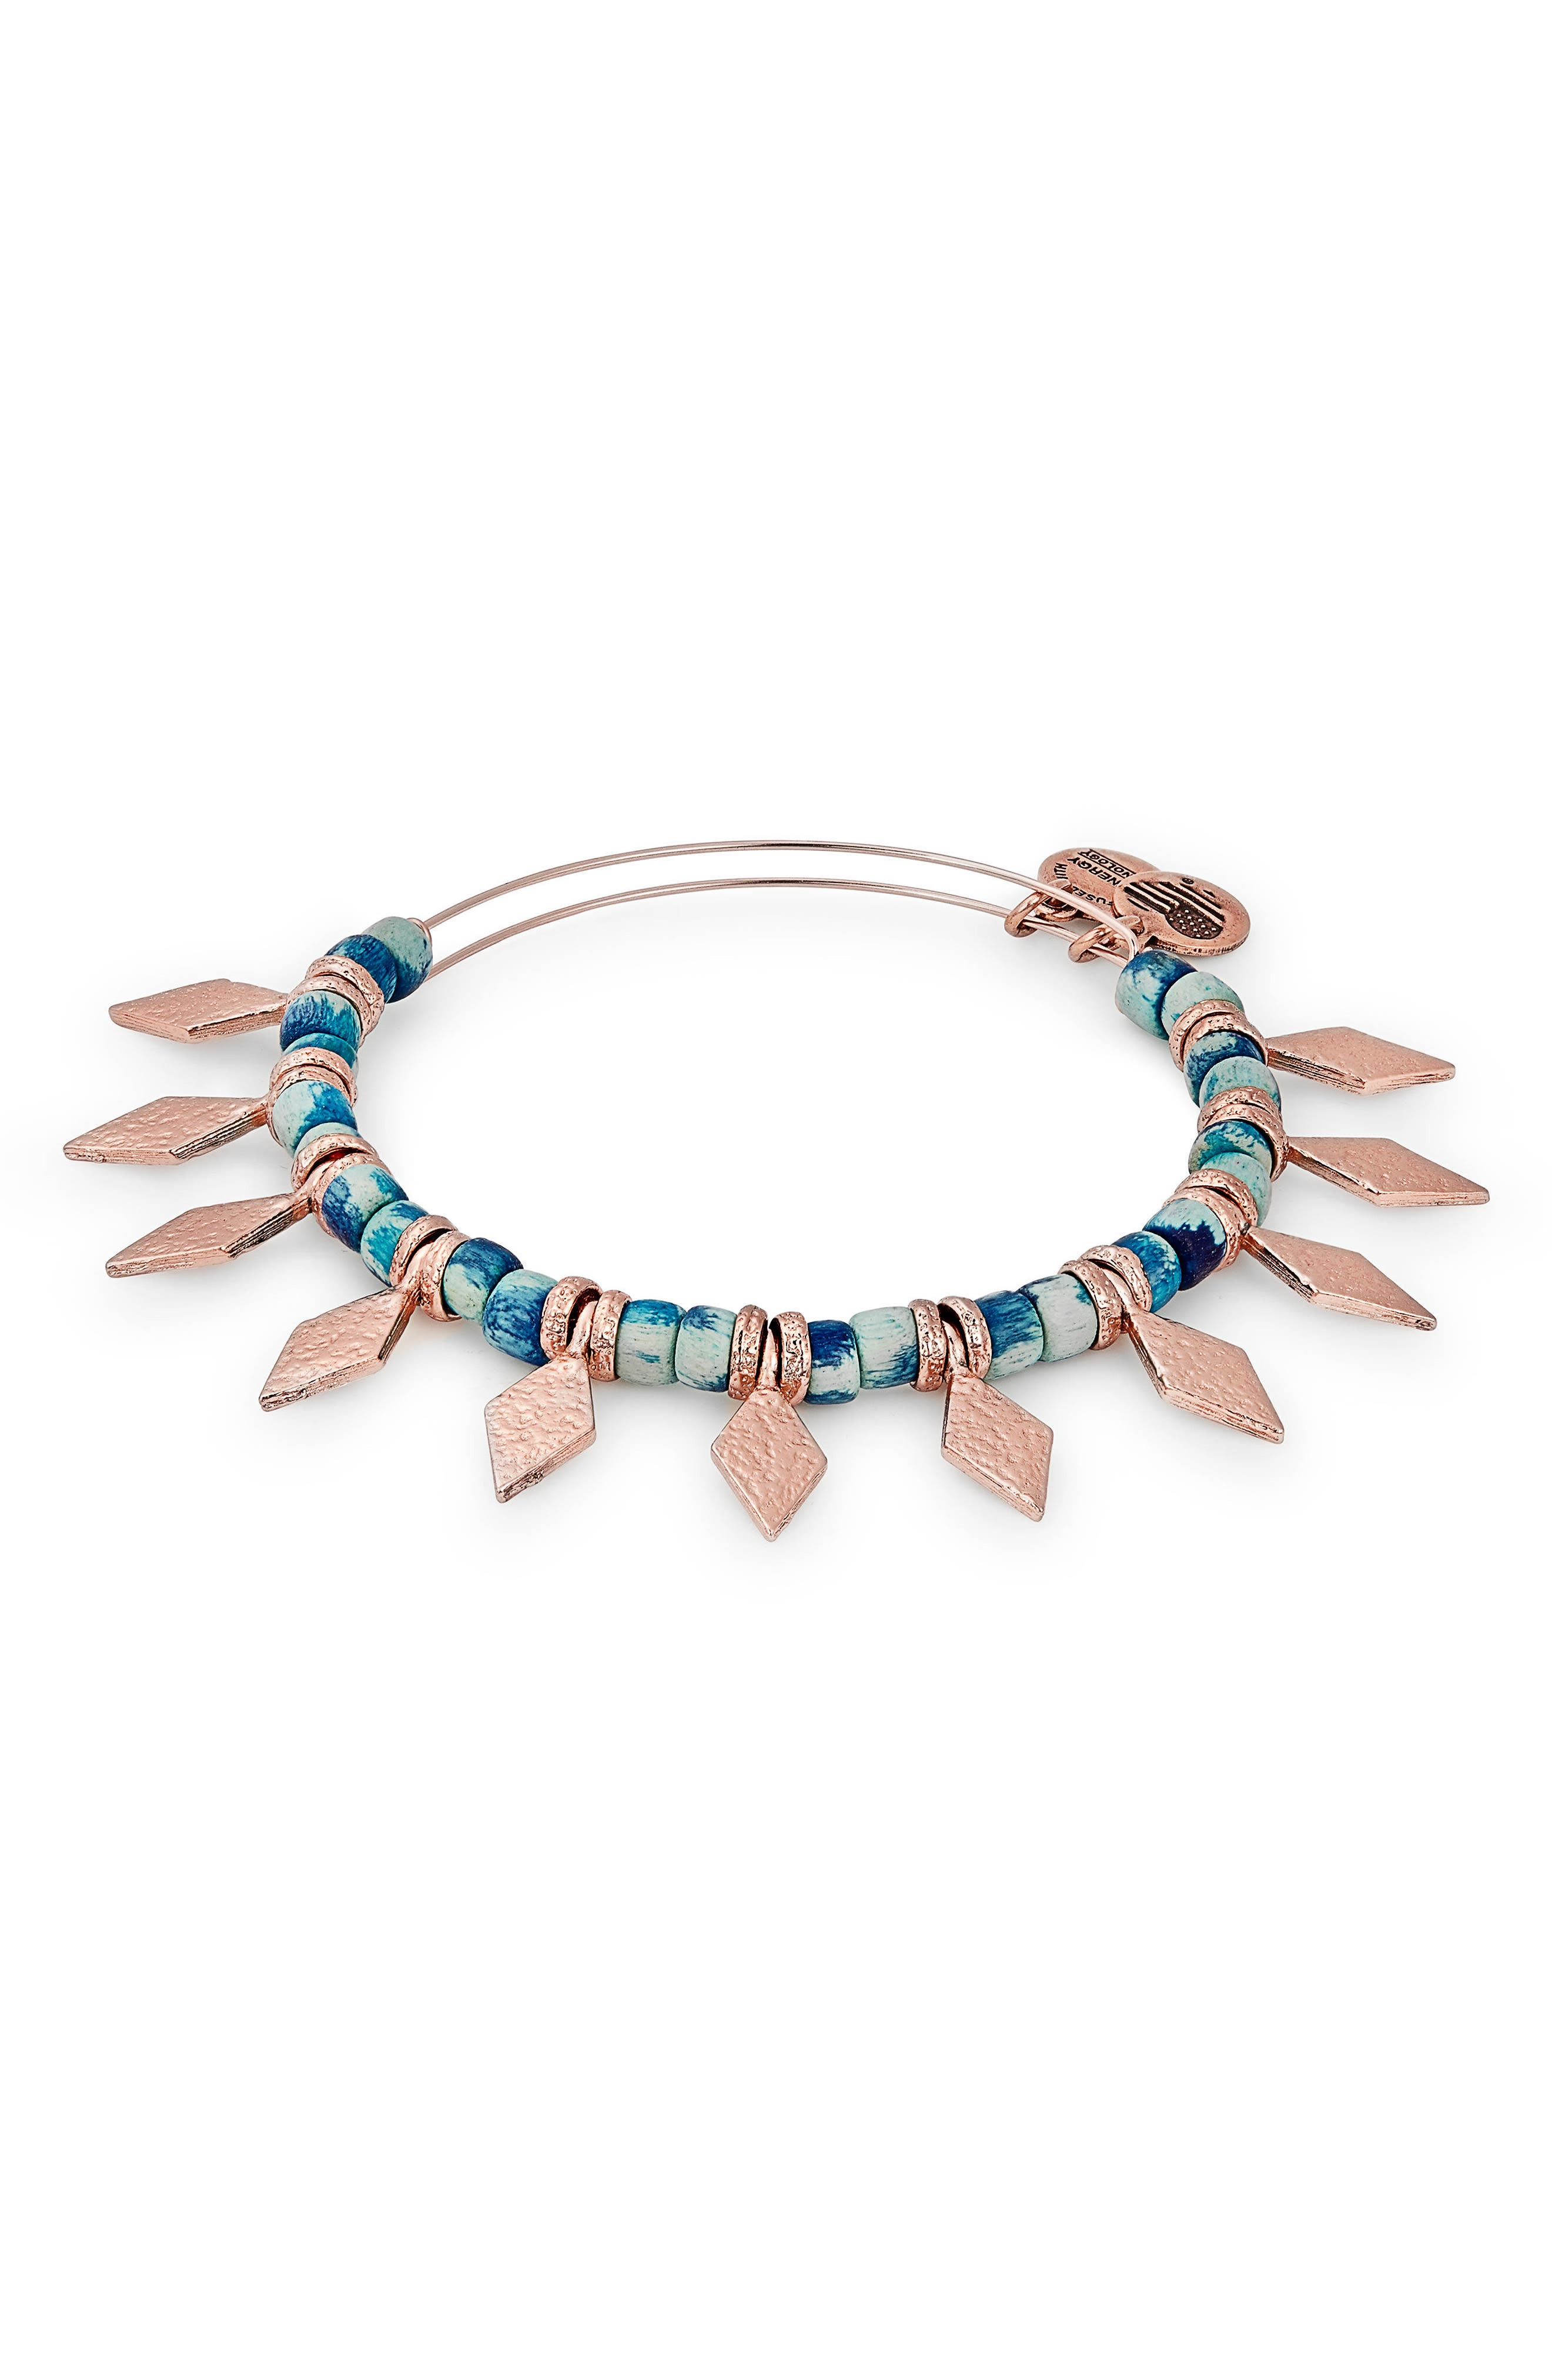 Spearhead Ocean Adjustable Bracelet,                         Main,                         color, Rose Gold Multi